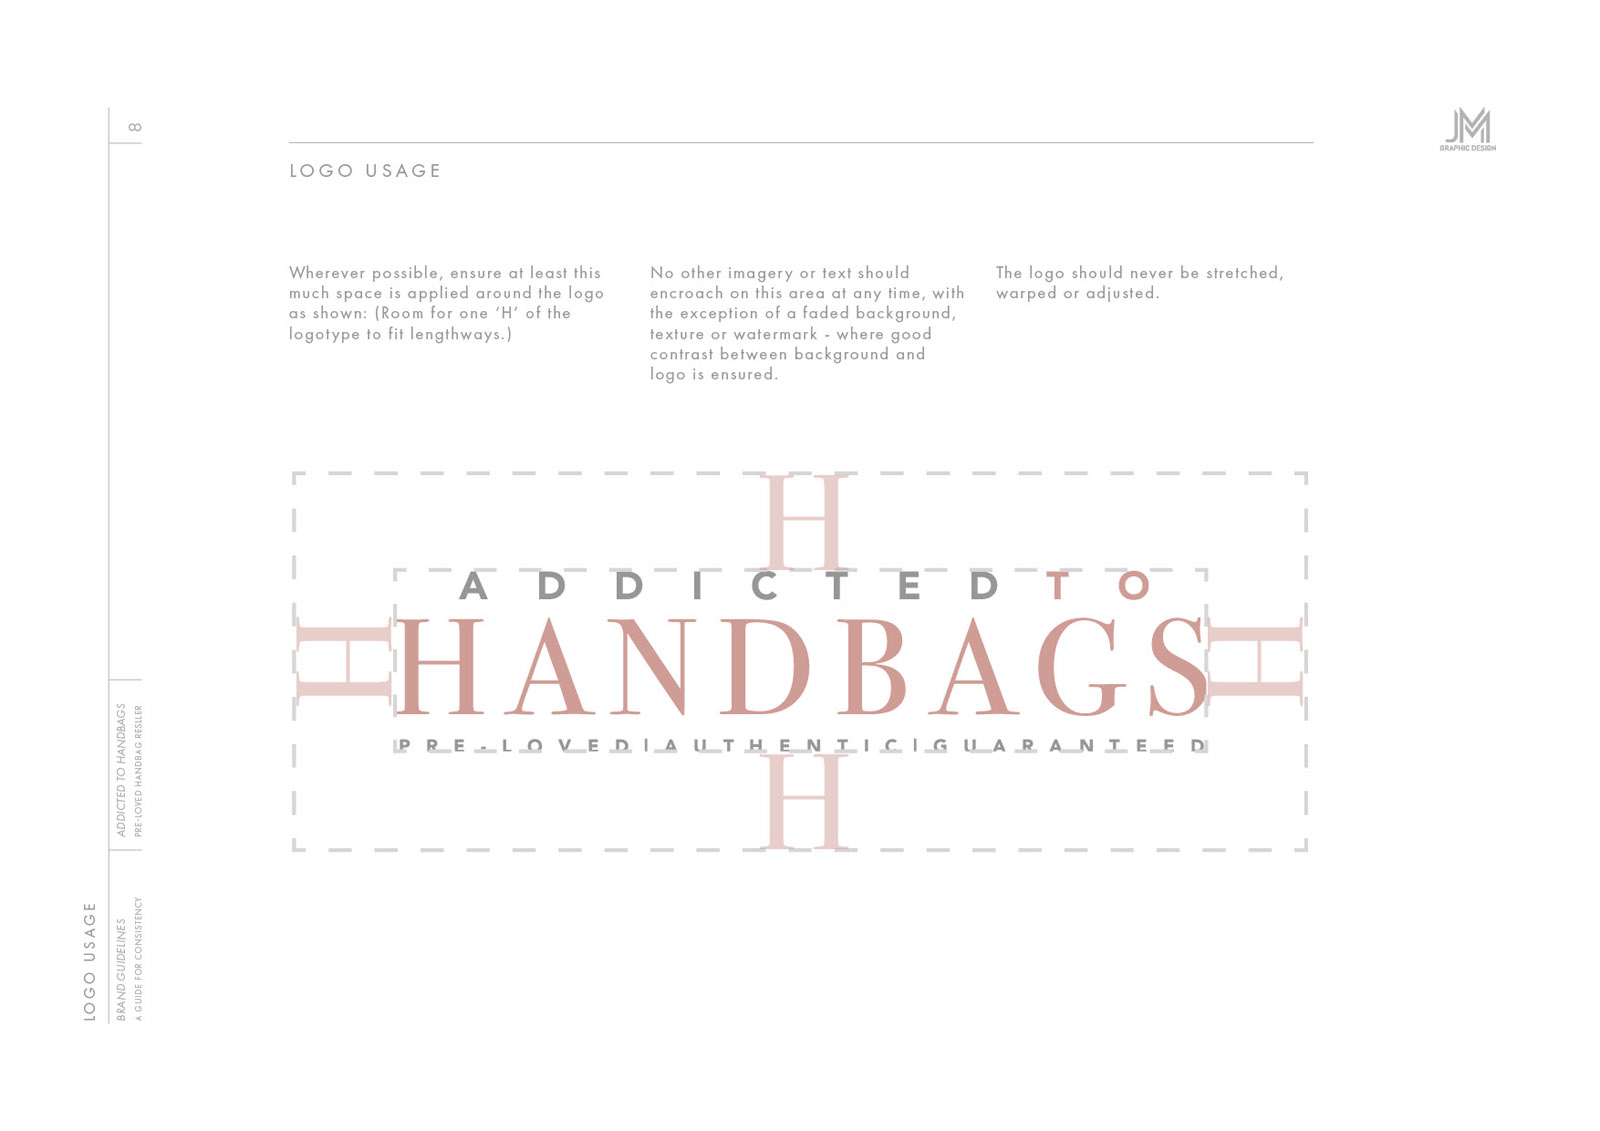 handbag-luxury-brand-identity-logo-design06